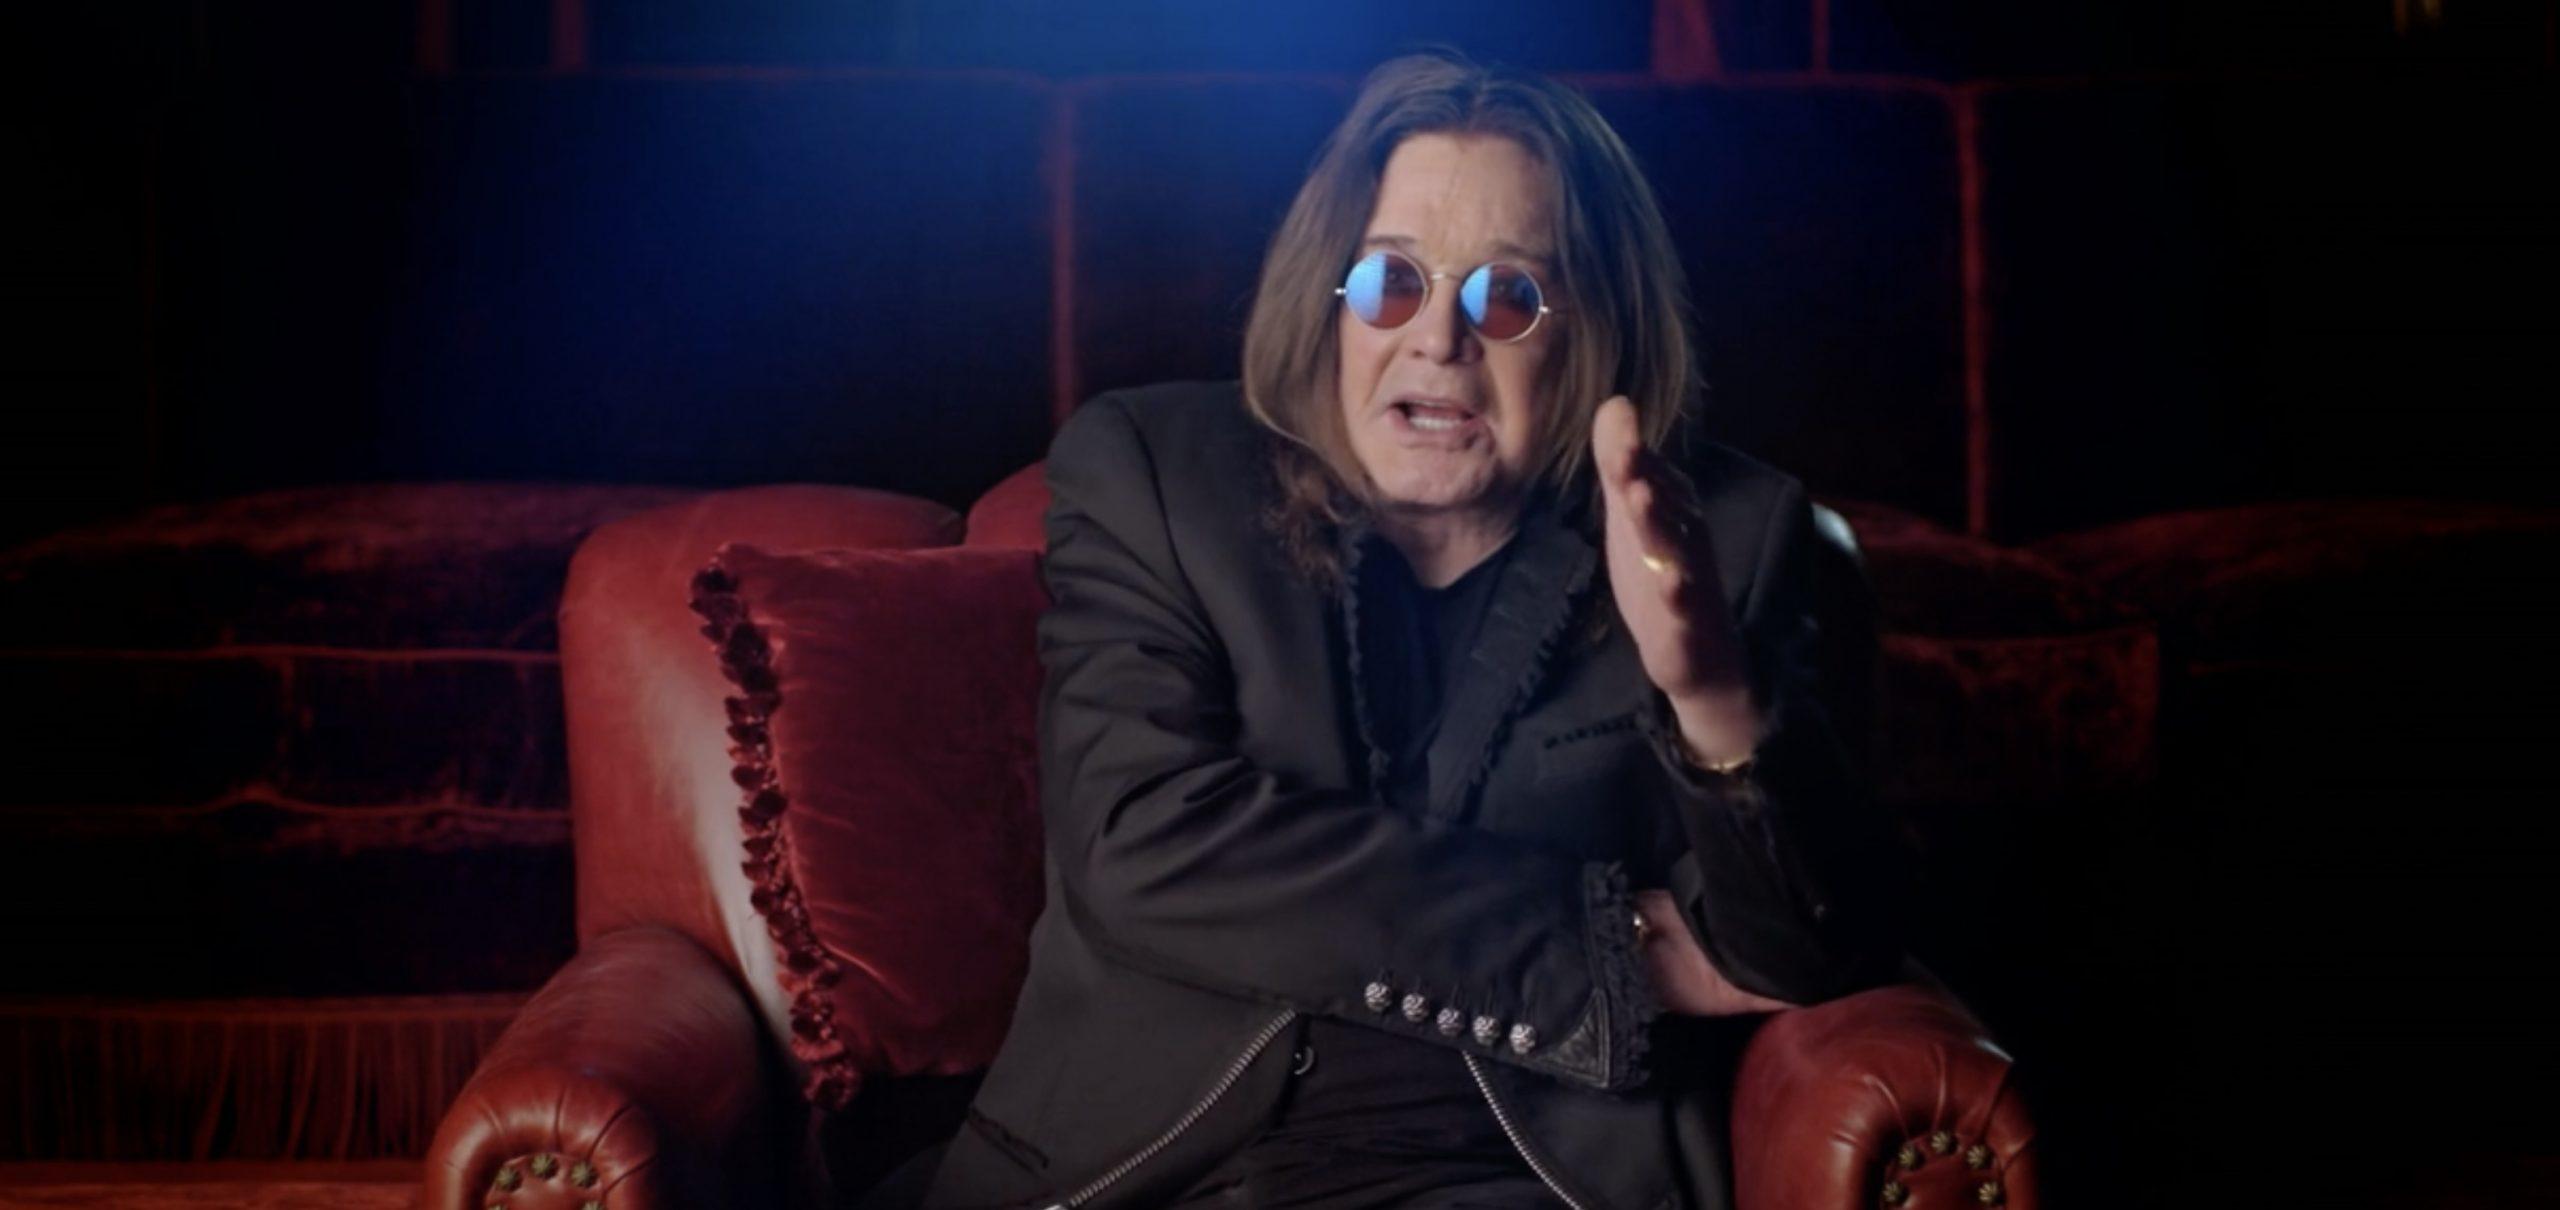 Ve el nuevo tráiler del documental de Ozzy Osbourne 'Biography: Nine Lives of Ozzy'